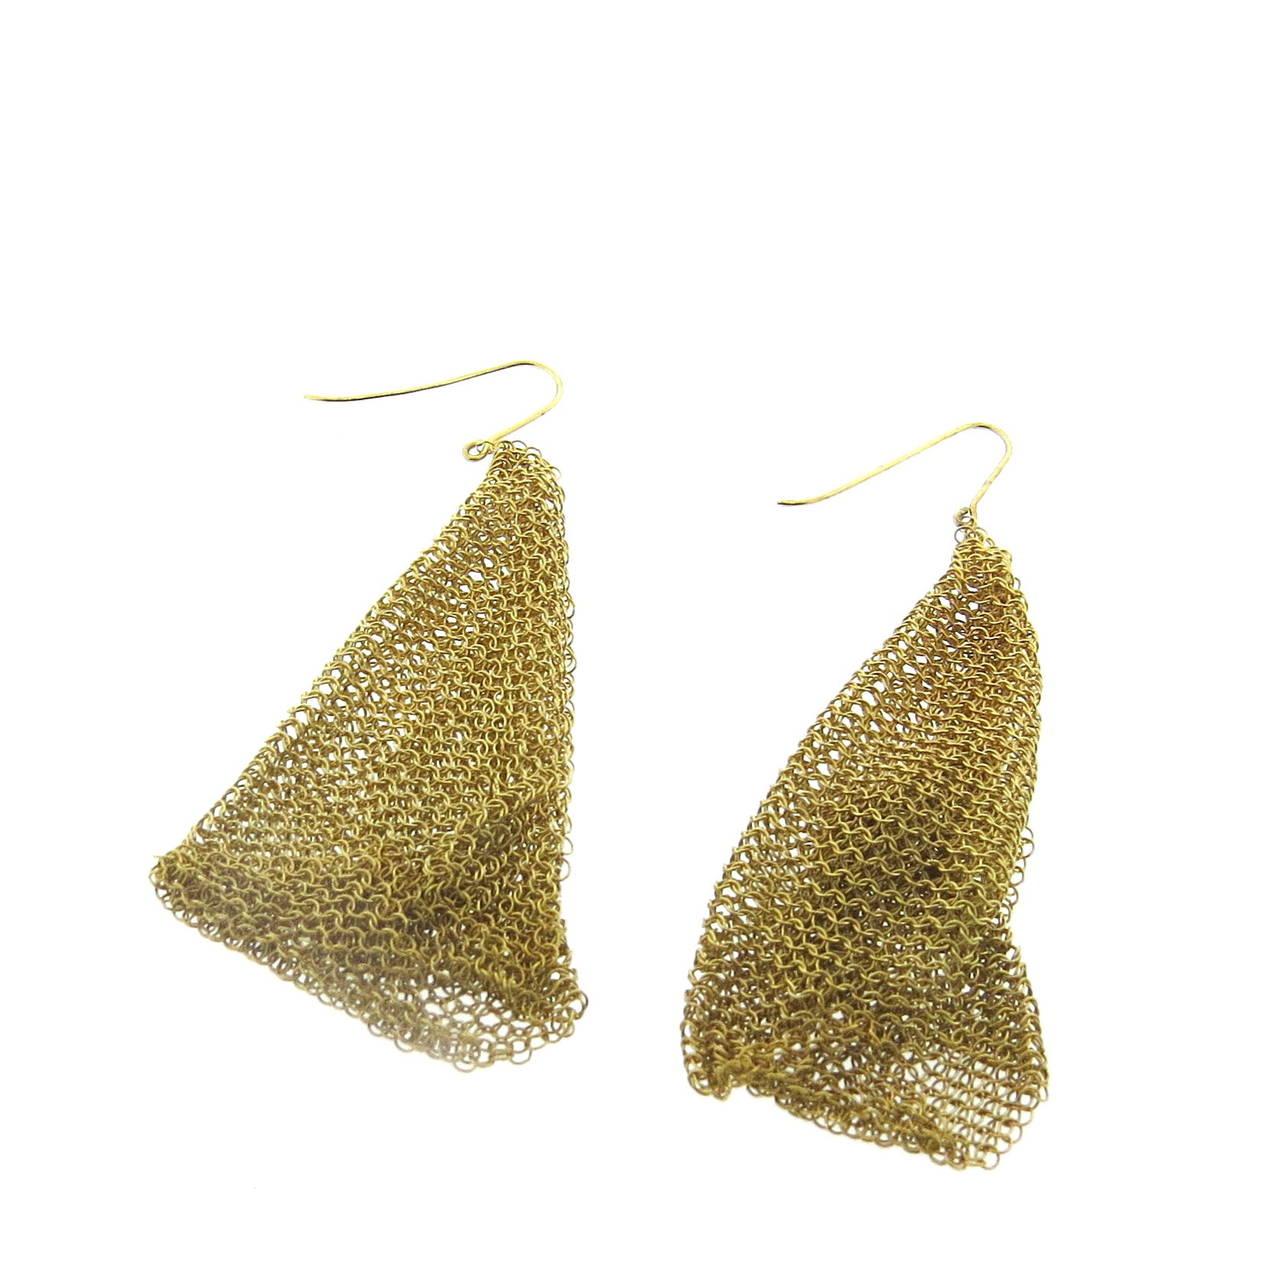 Tiffany & Co. Elsa Peretti Gold Mesh Scarf Long Earrings 2